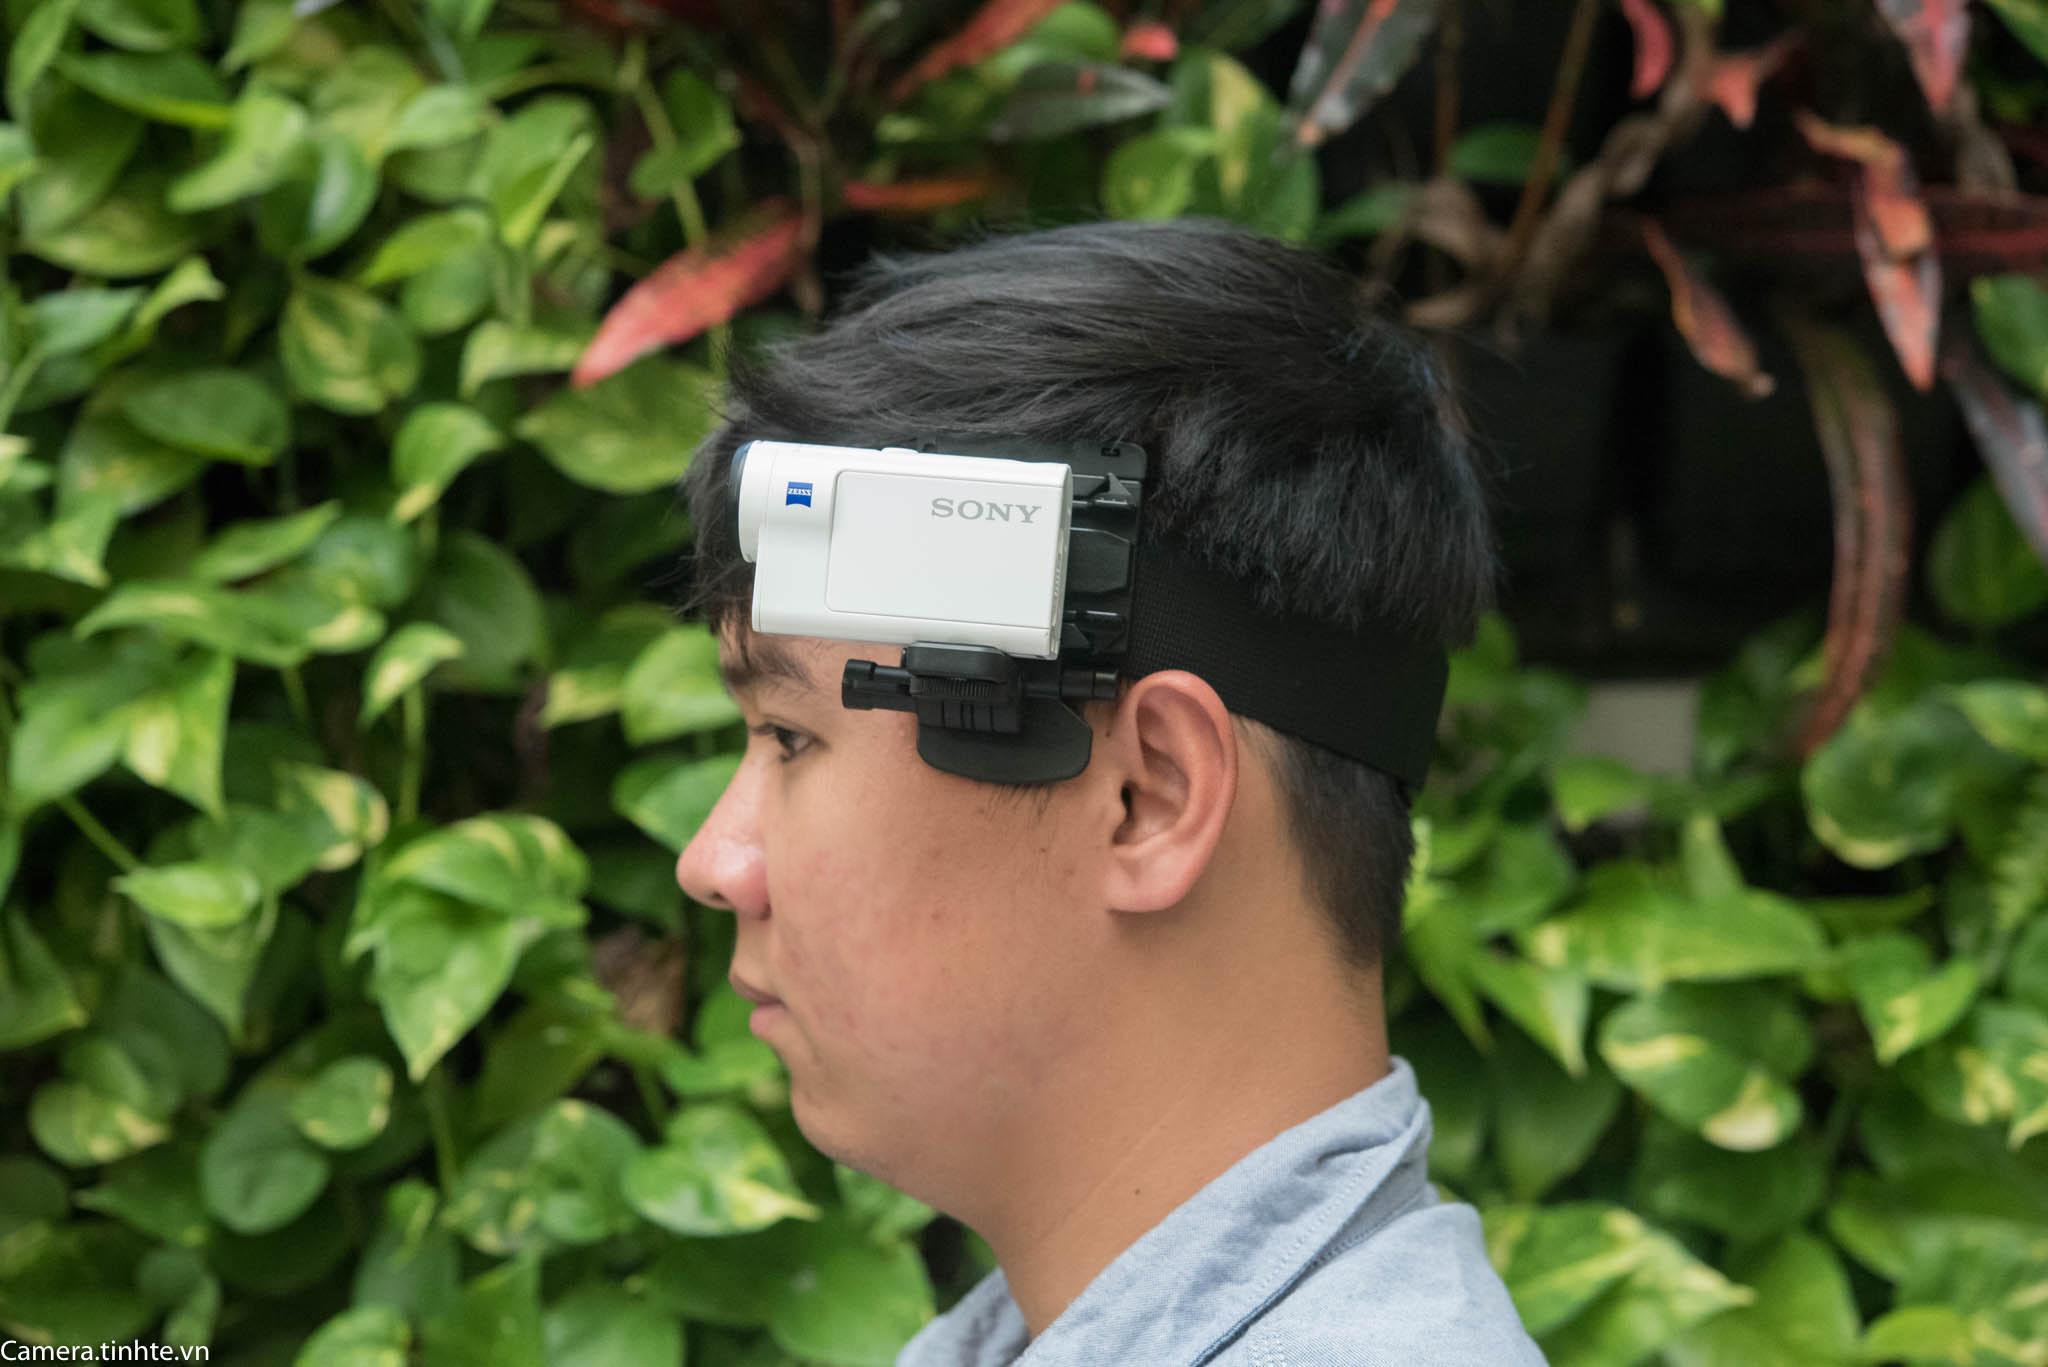 Phu kien Sony FDR-X3000 - Camera.tinhte.vn -7.jpg